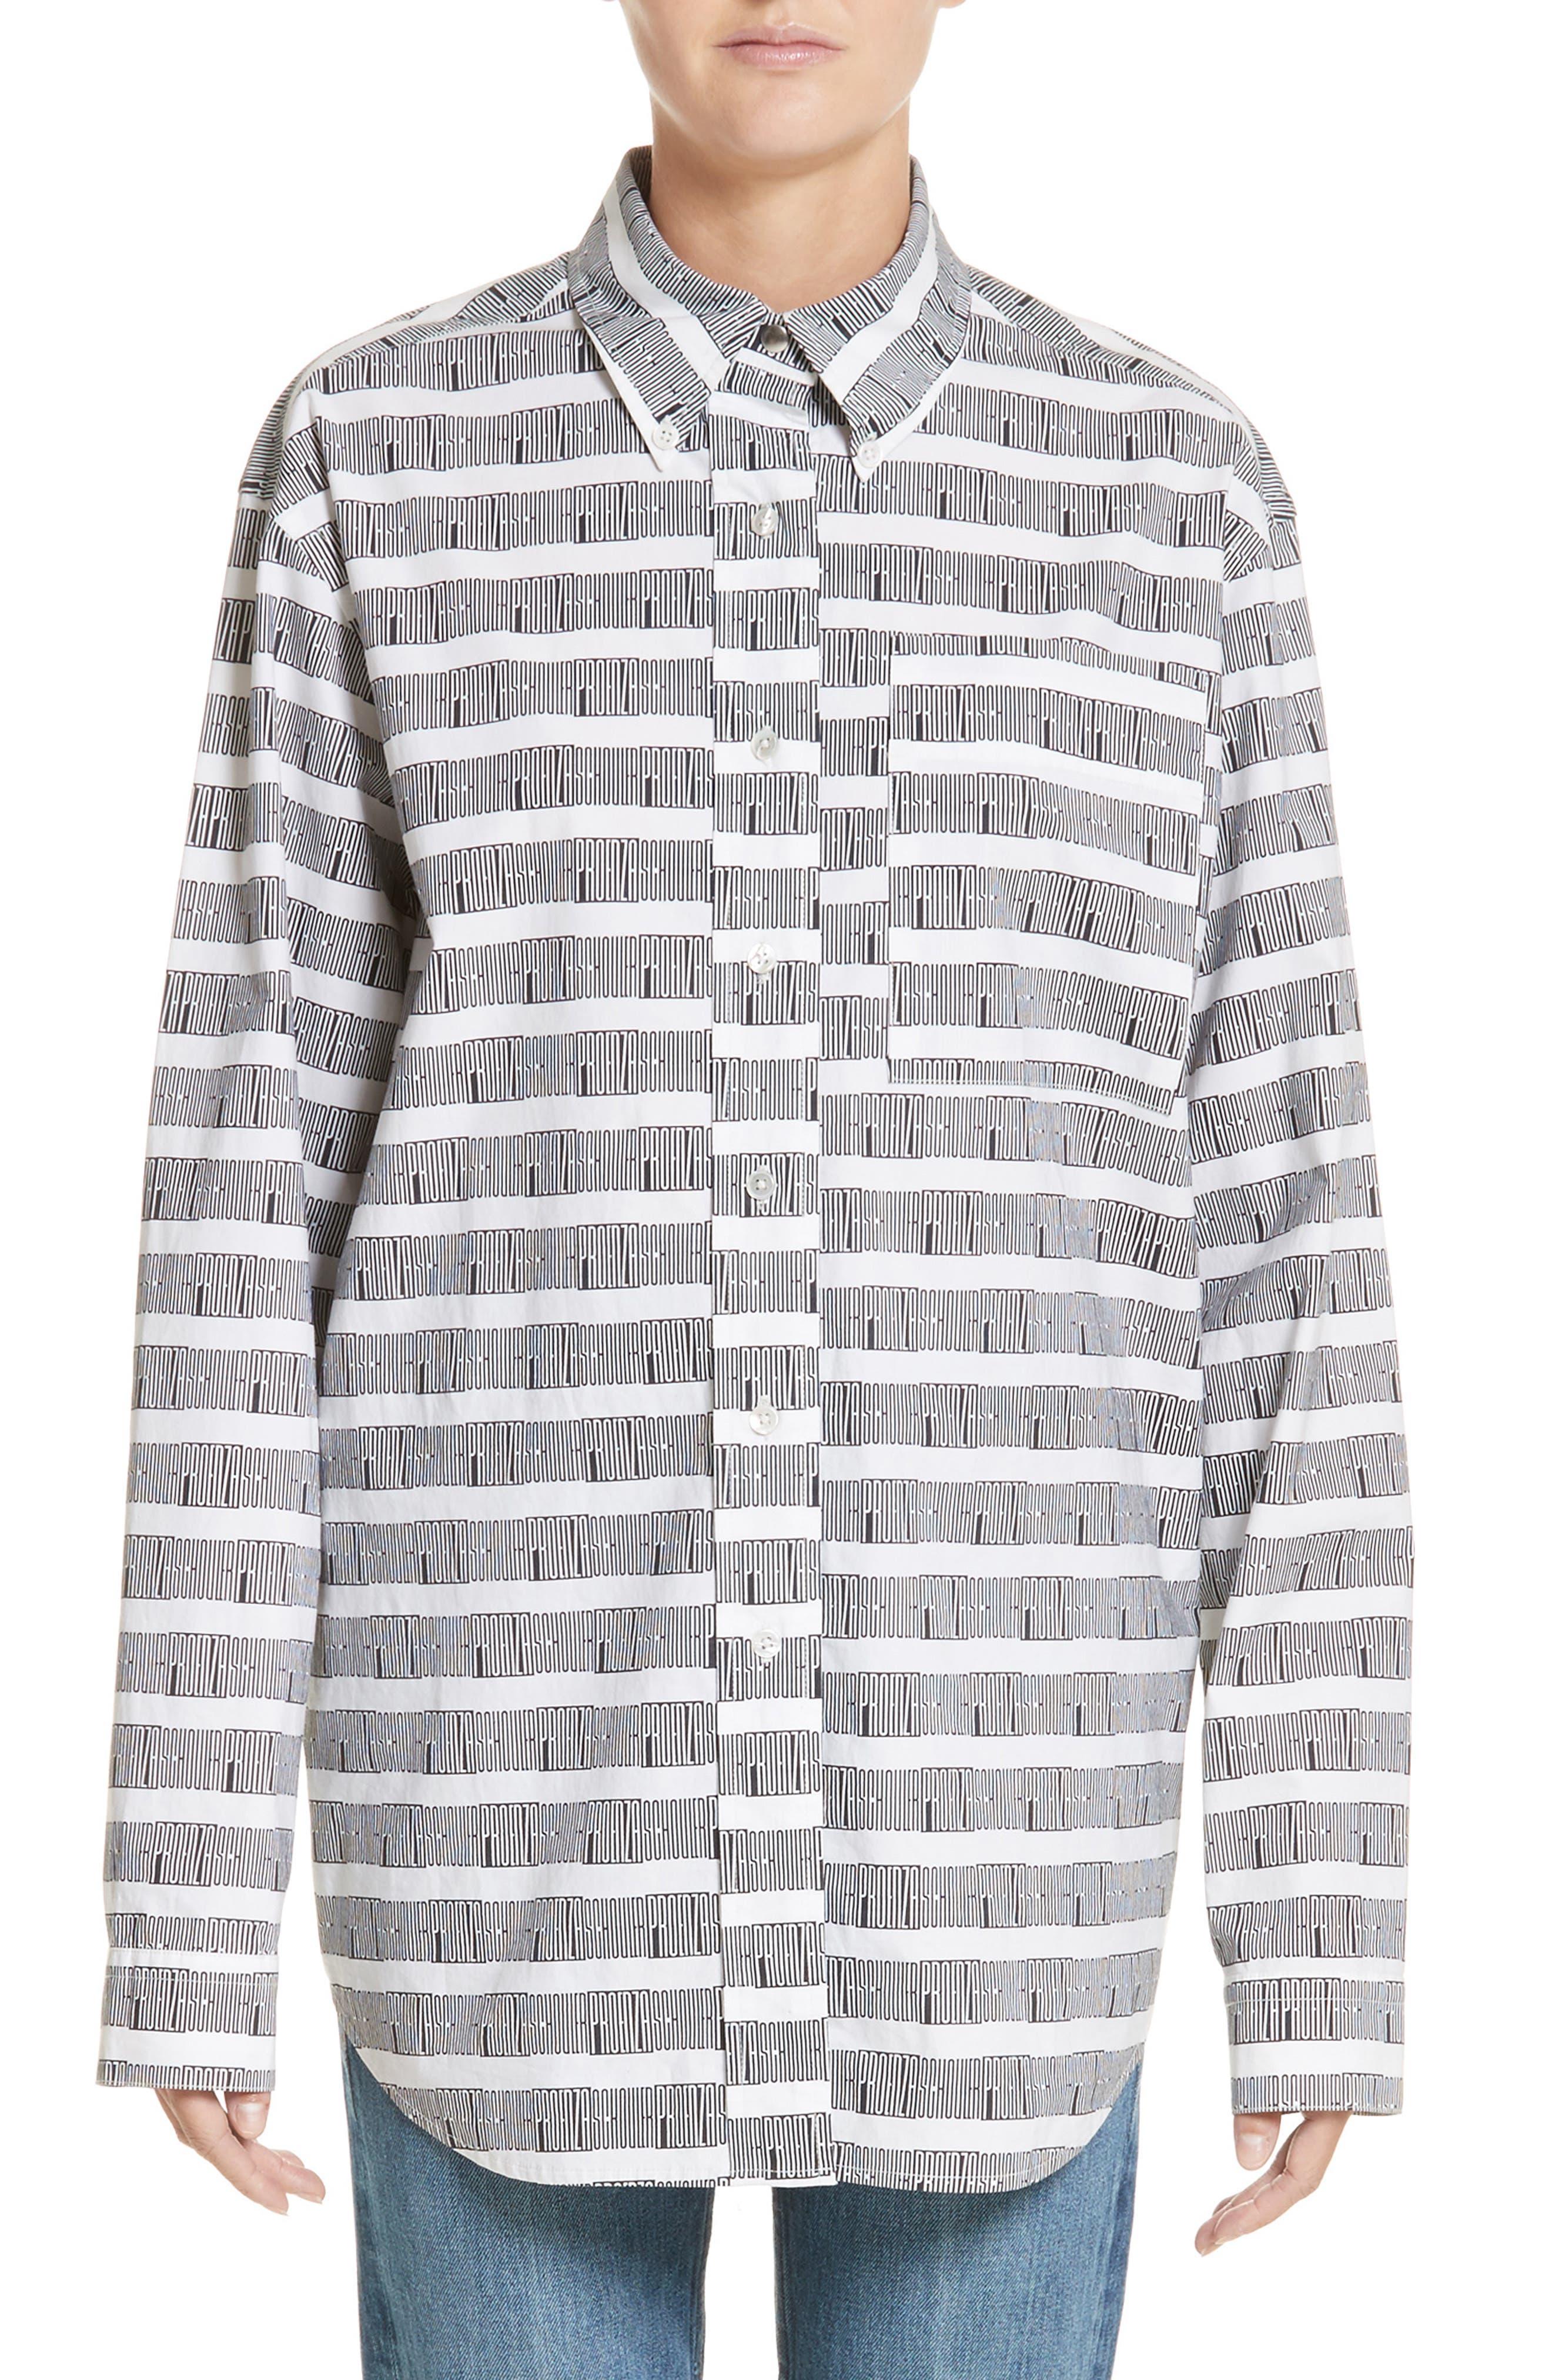 PSWL Graphic Stripe Cotton Top,                         Main,                         color,